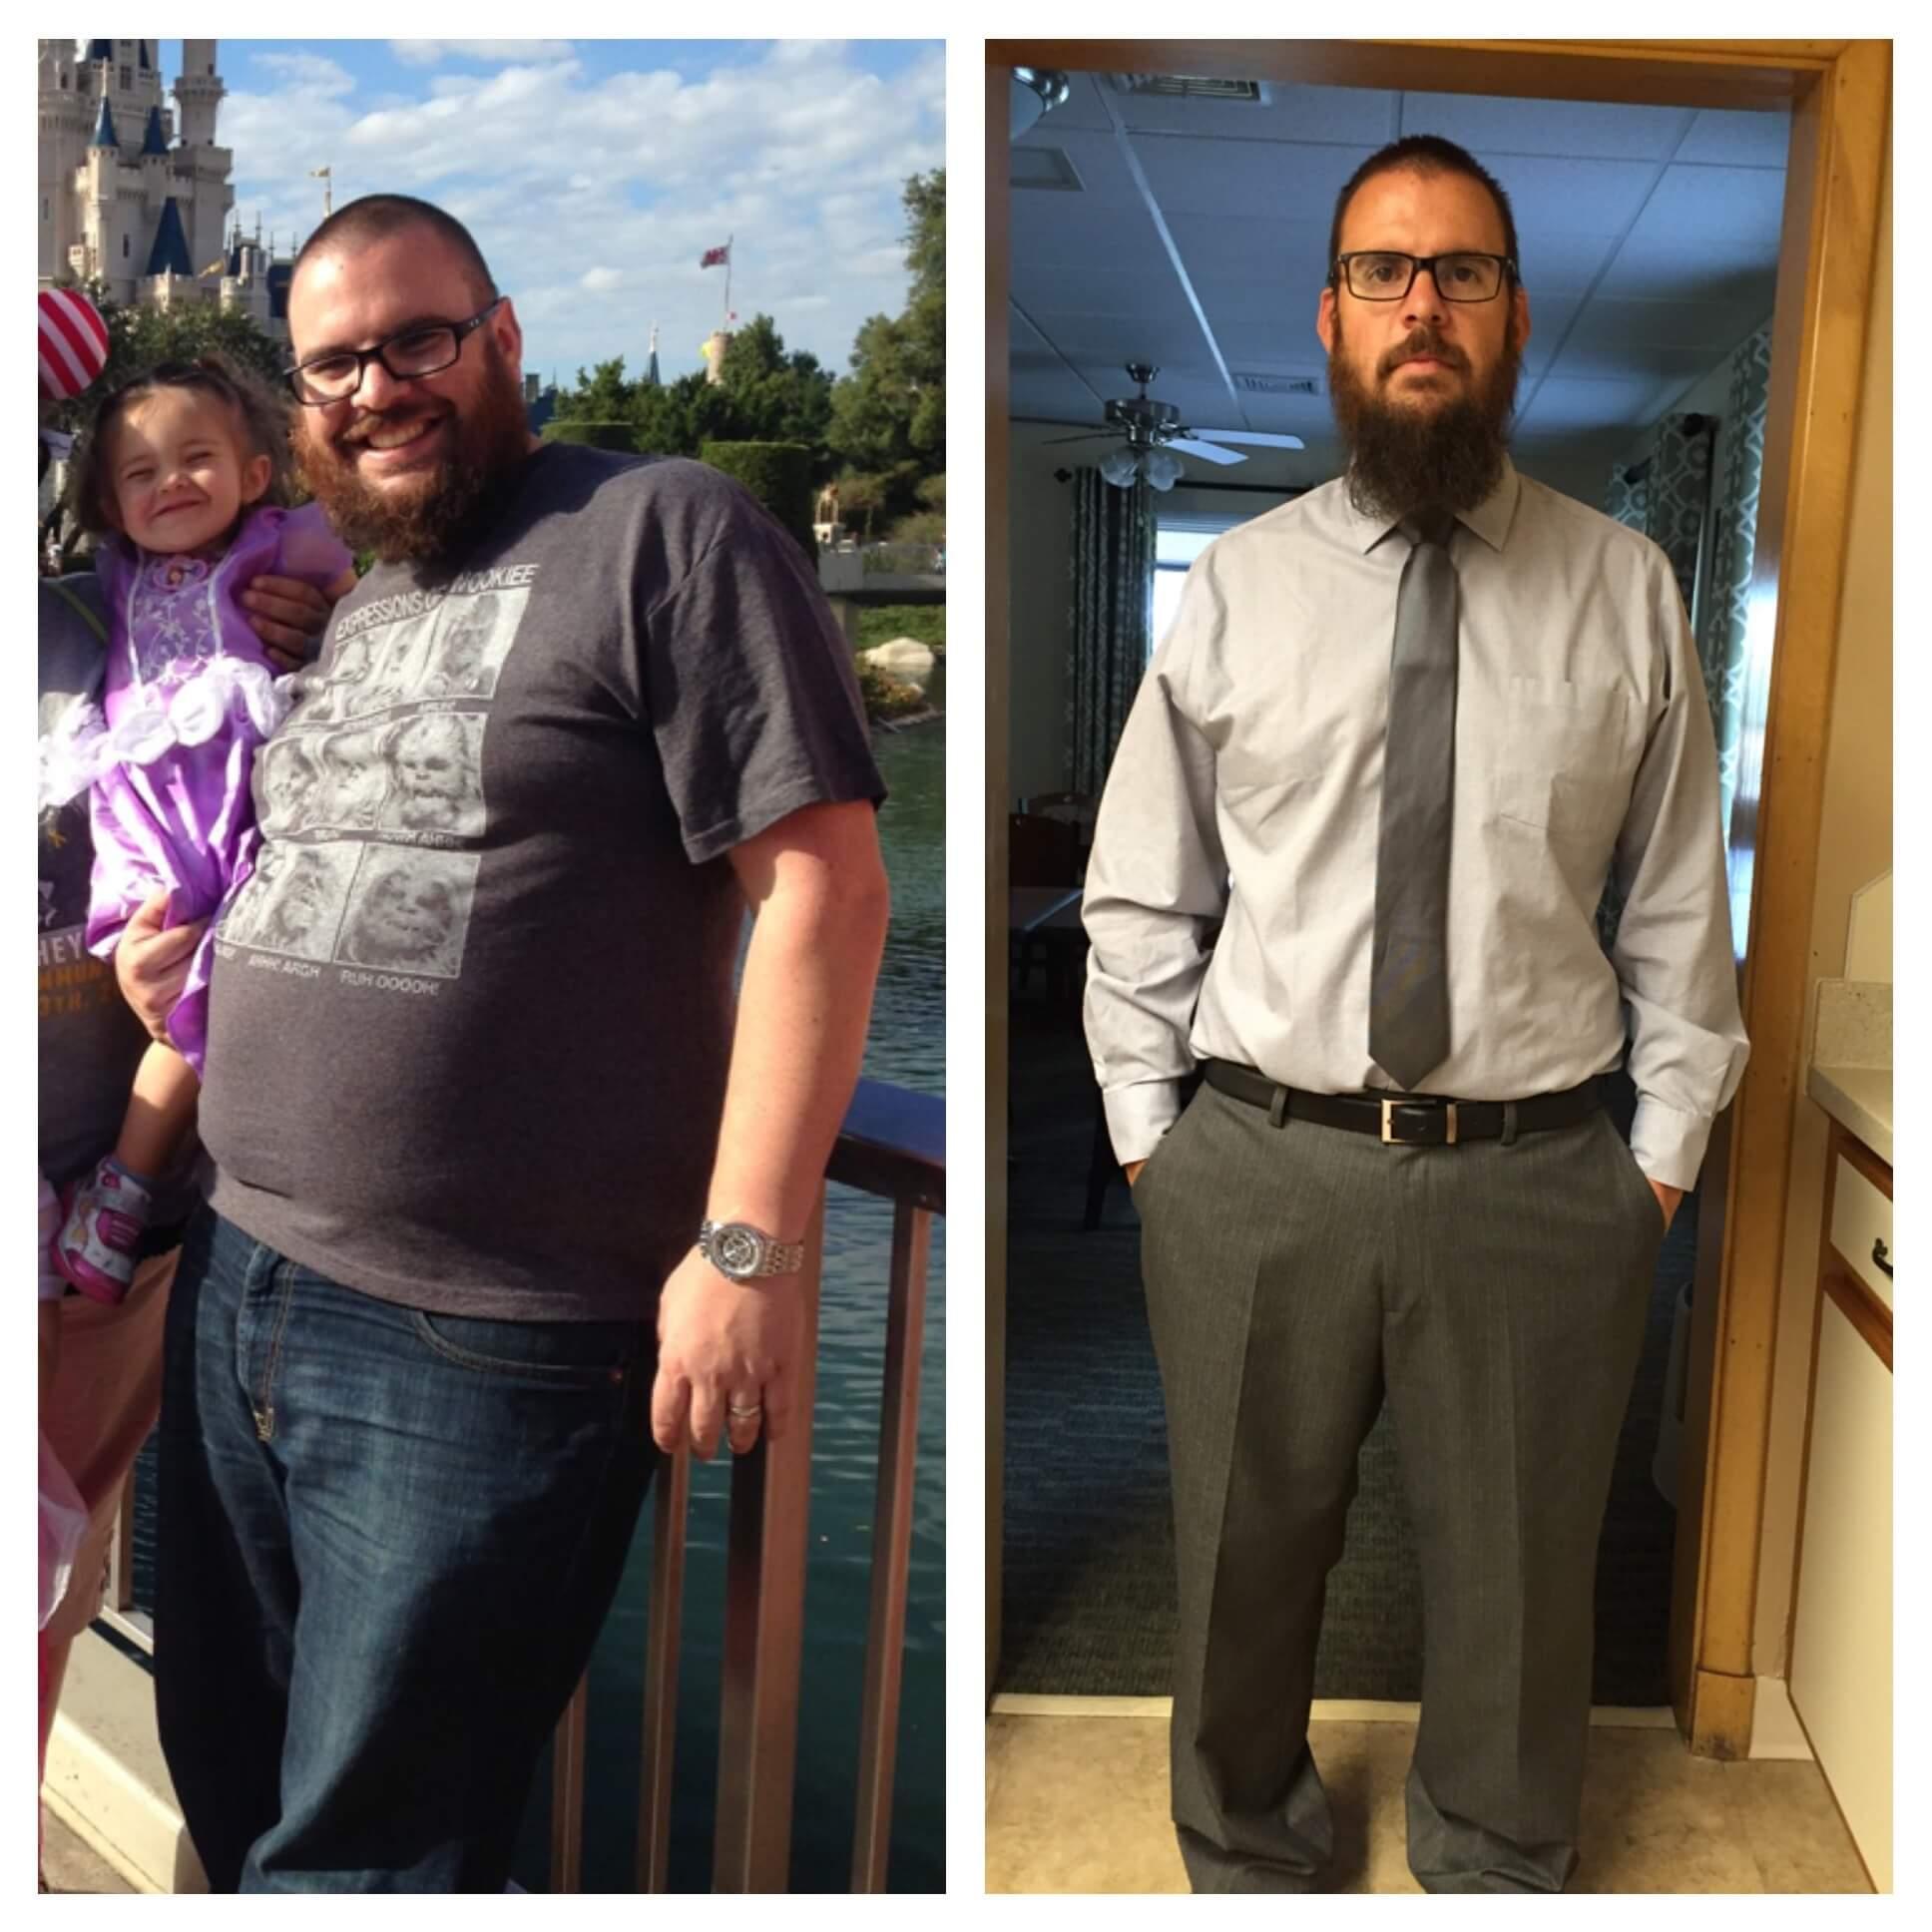 Thomas Medeiros Lost Over 70 lbs